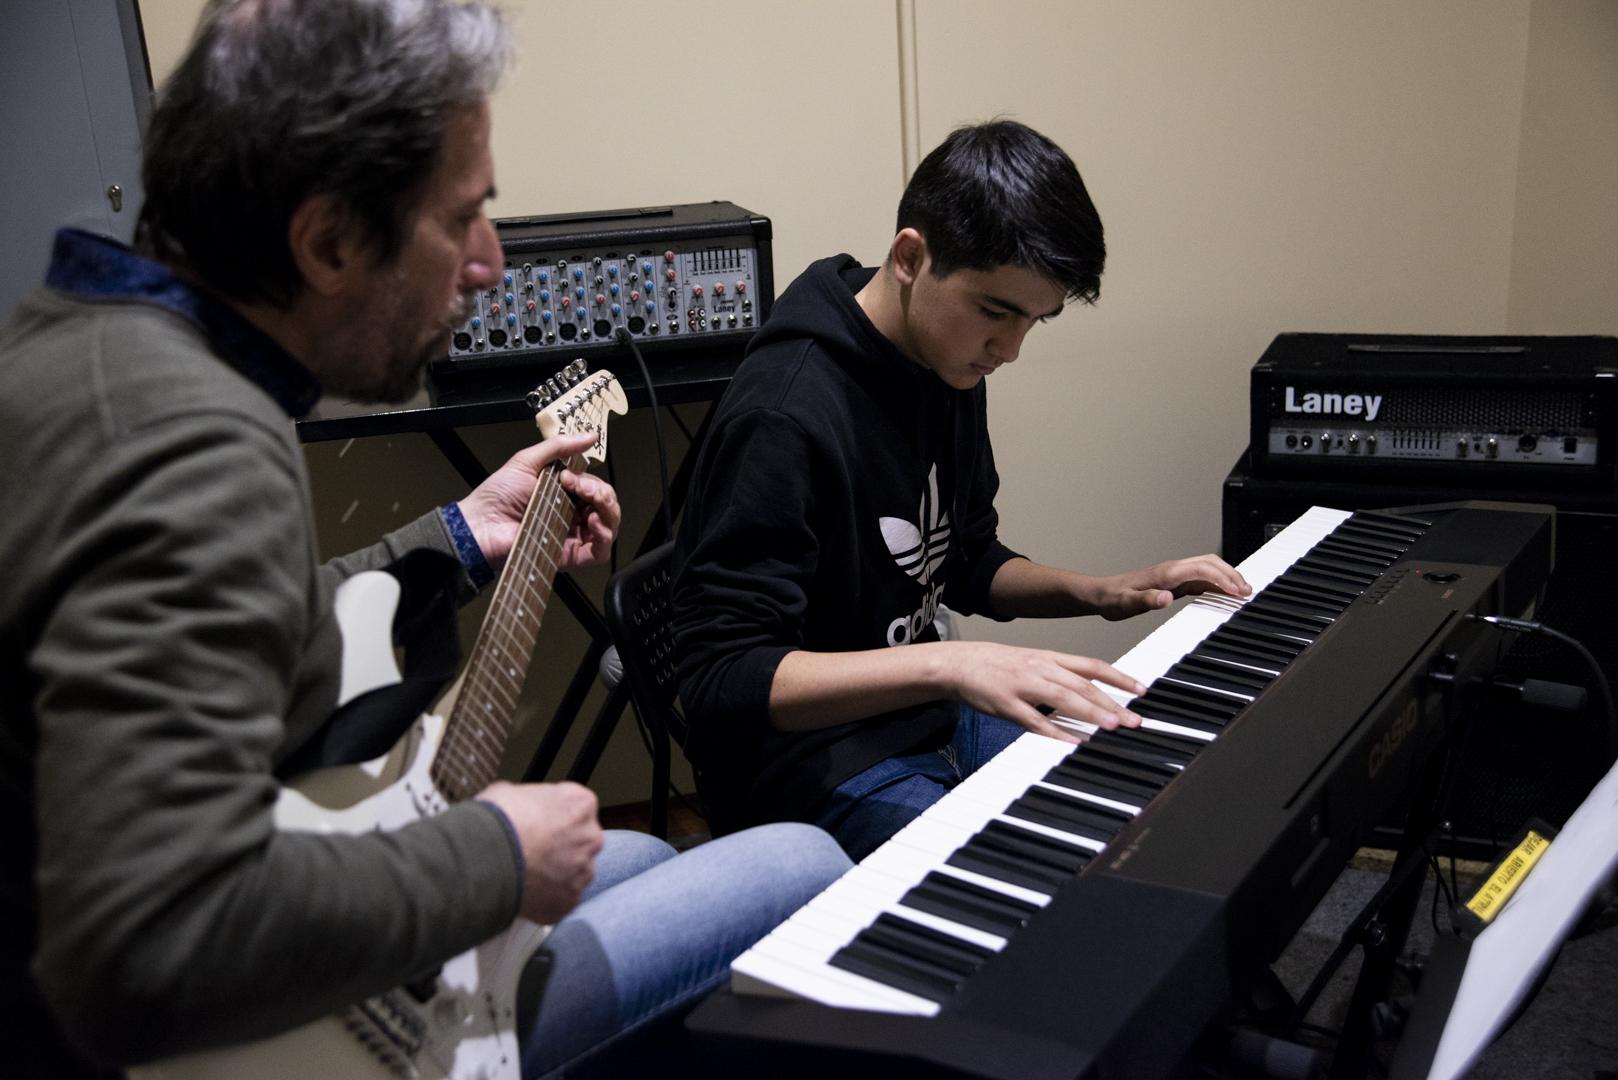 Lizard, un método innovador de aprendizaje musical